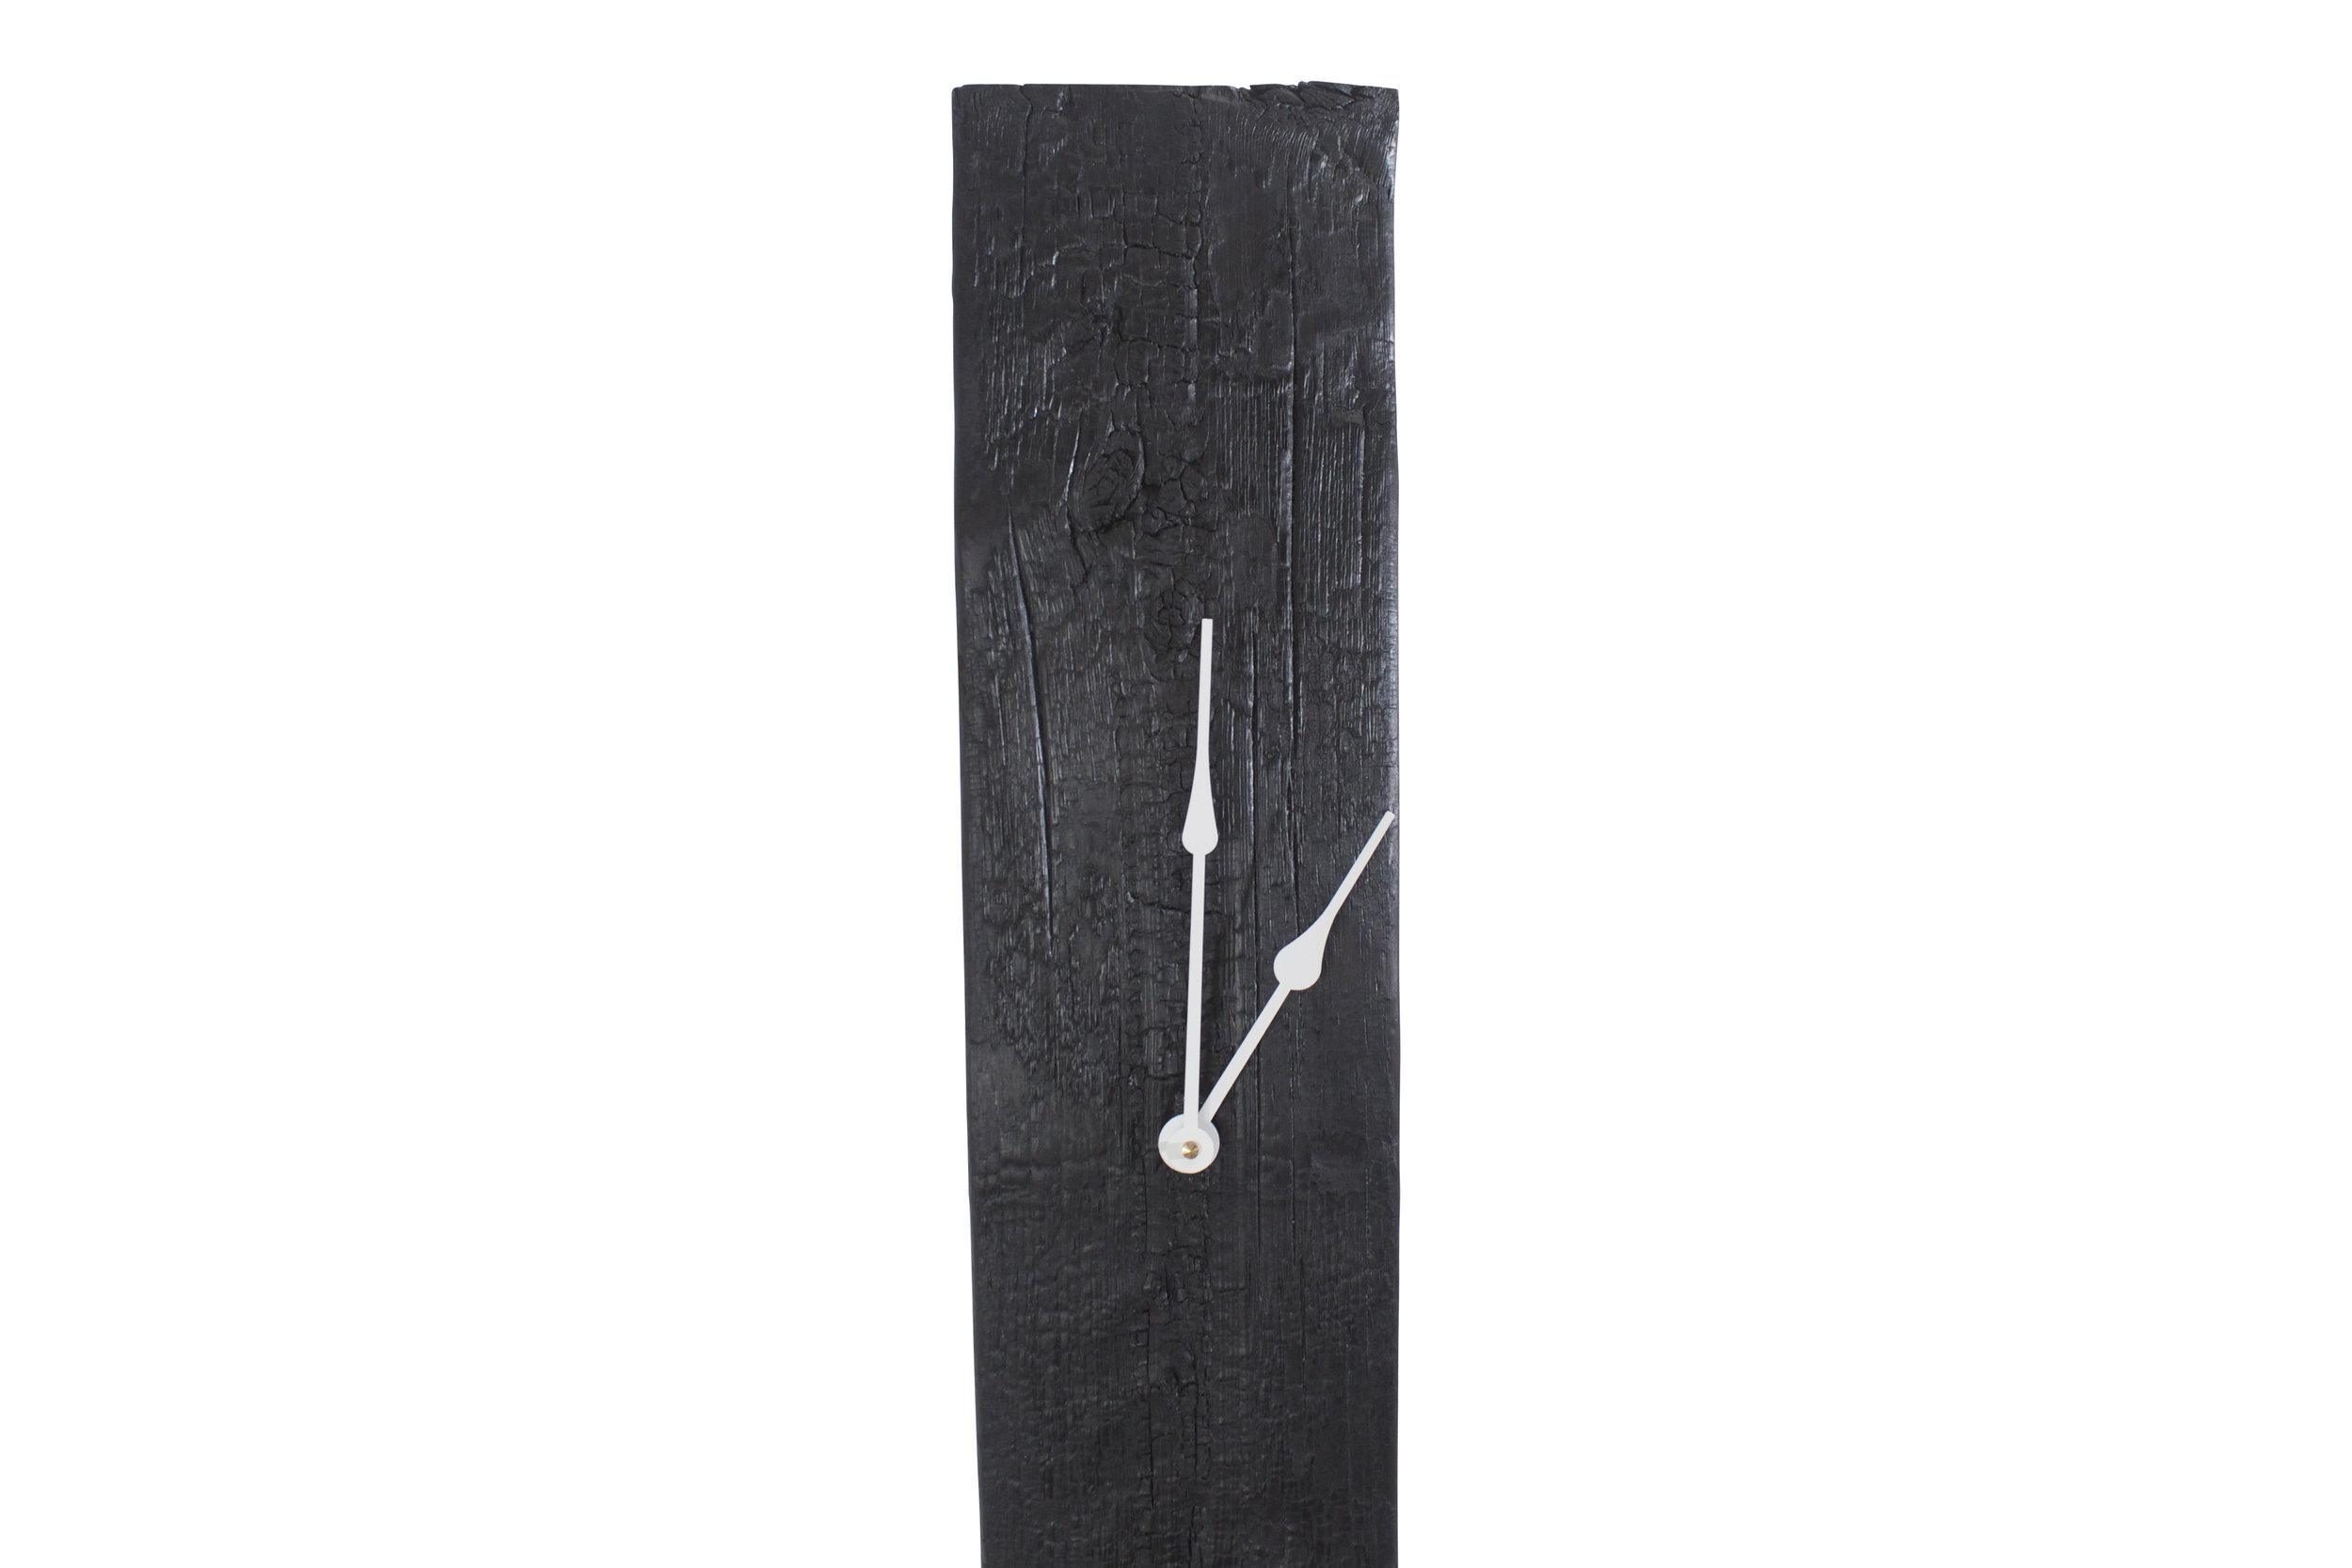 Stefan Rurak_Grandfather Clock_Charred2.jpg